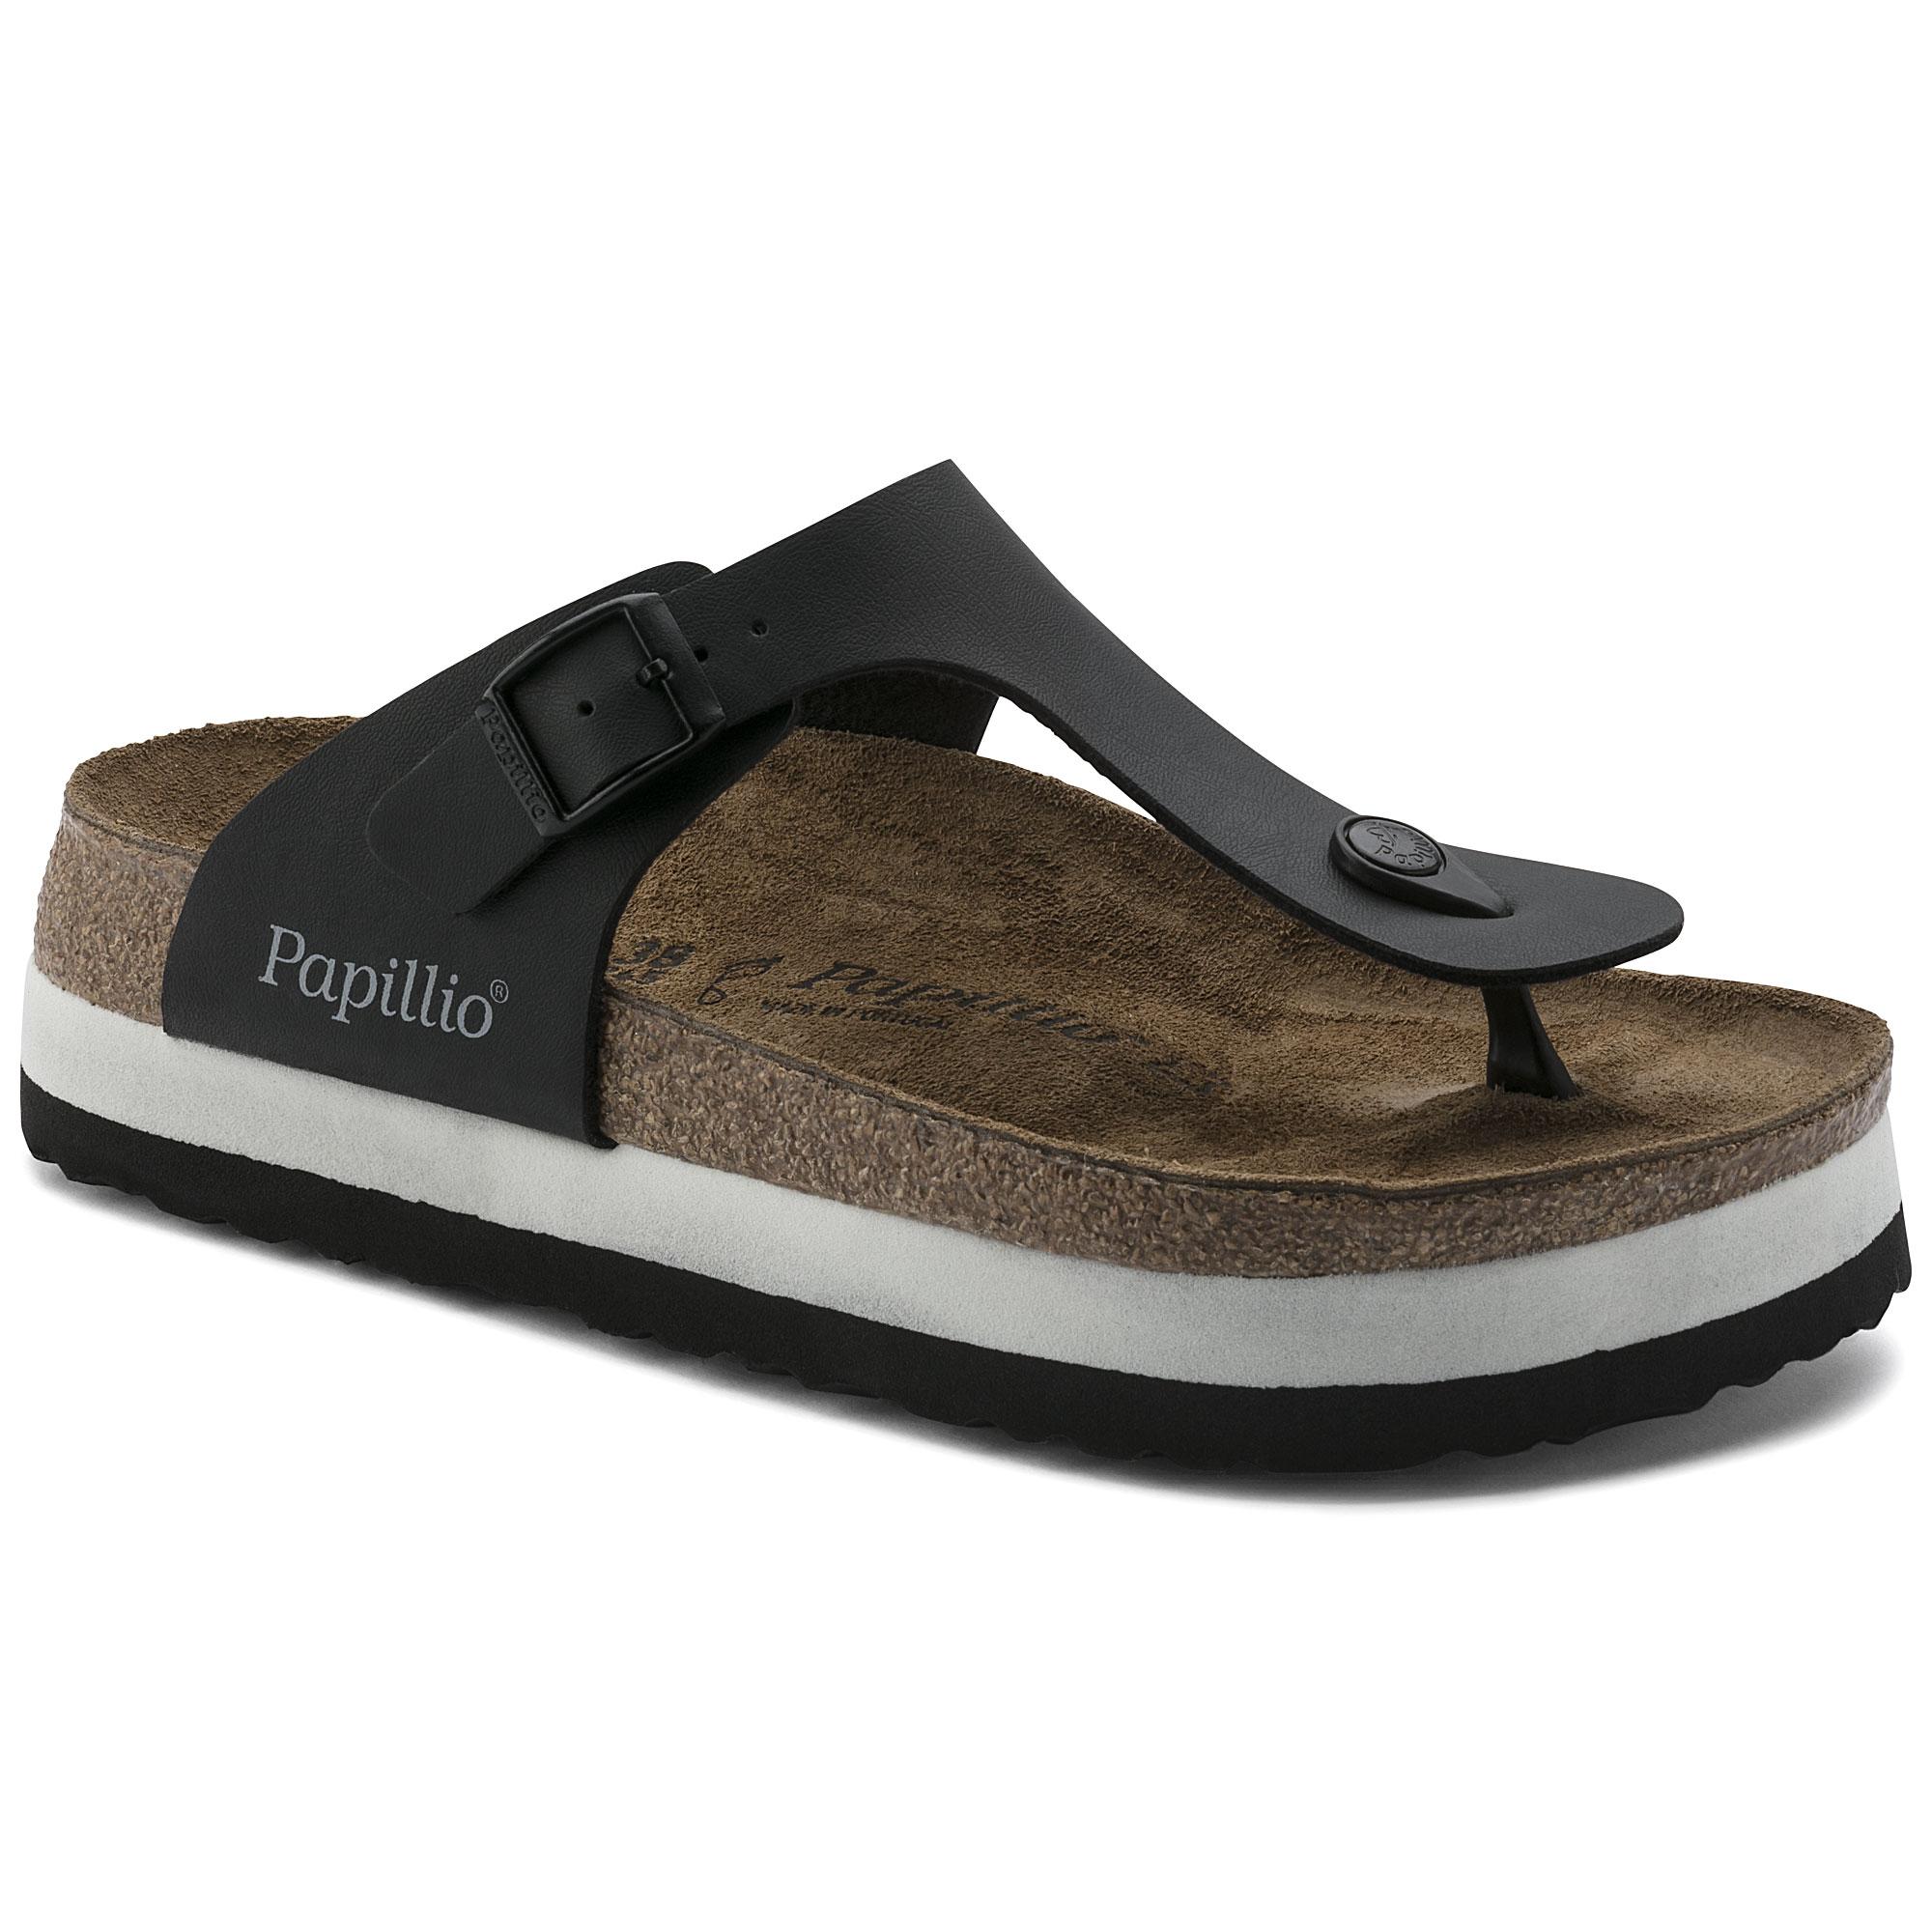 Birkenstock Papillio Gizeh Birko flor Toe Sandal Ladies Platform Shoes Sandals | eBay